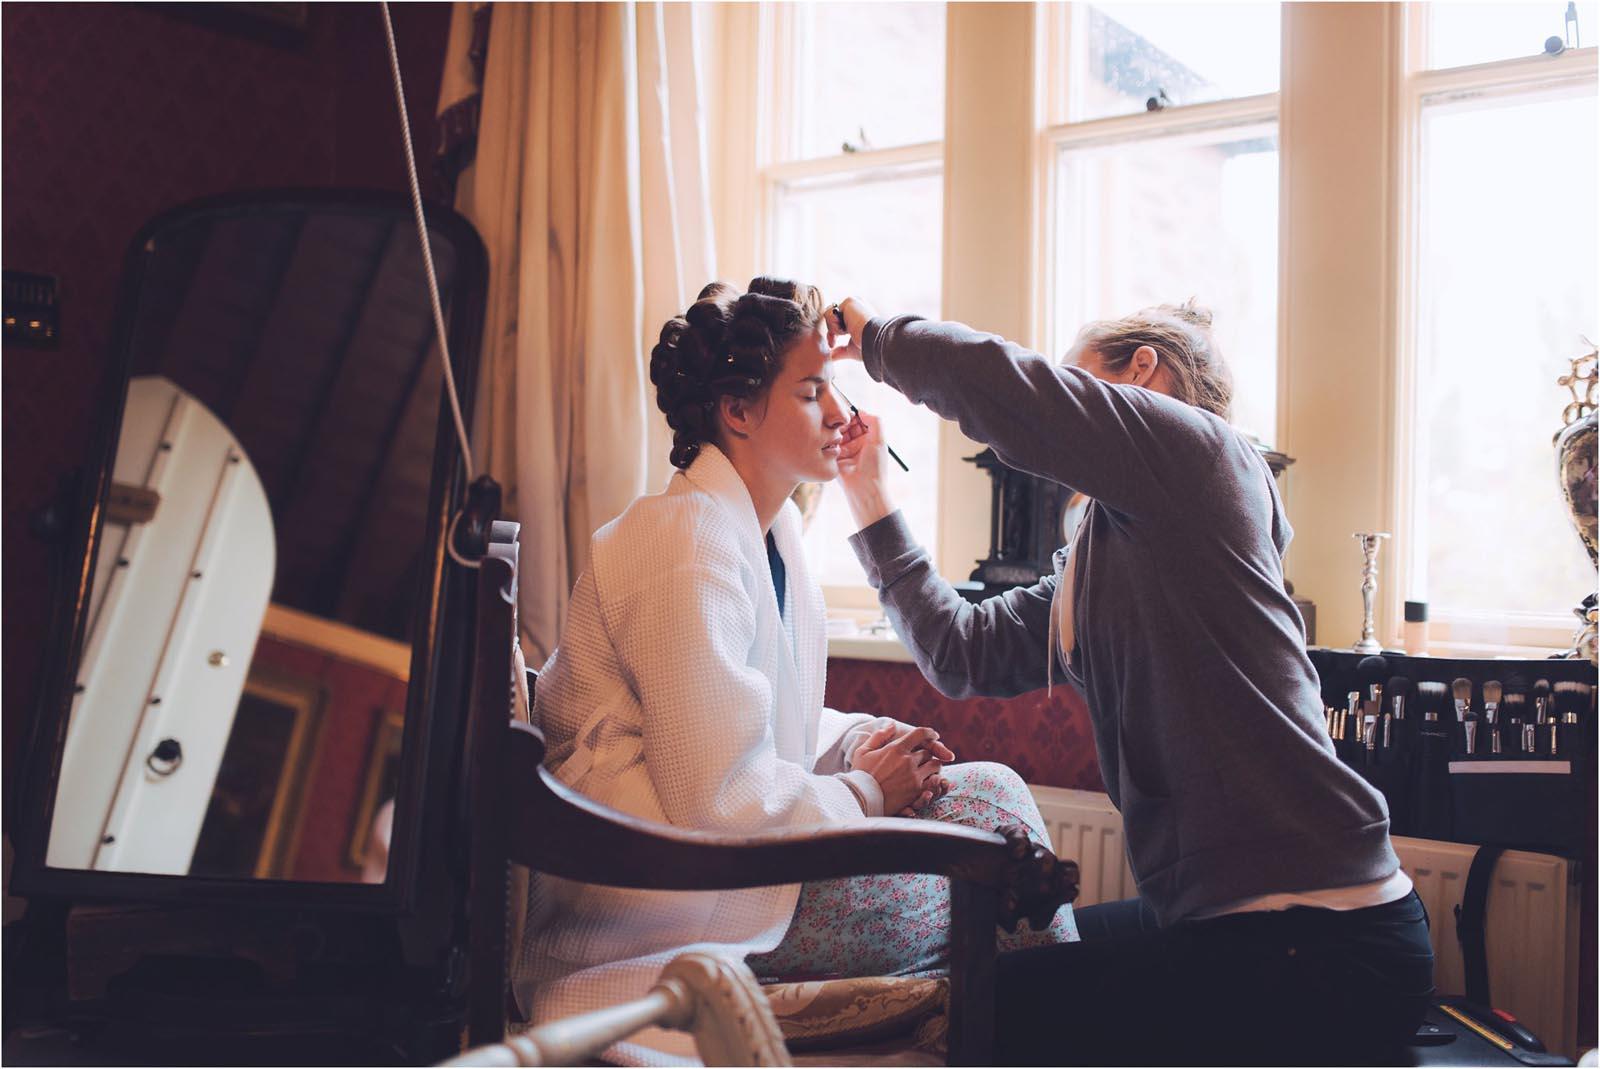 Simon biffen wedding photography 0014